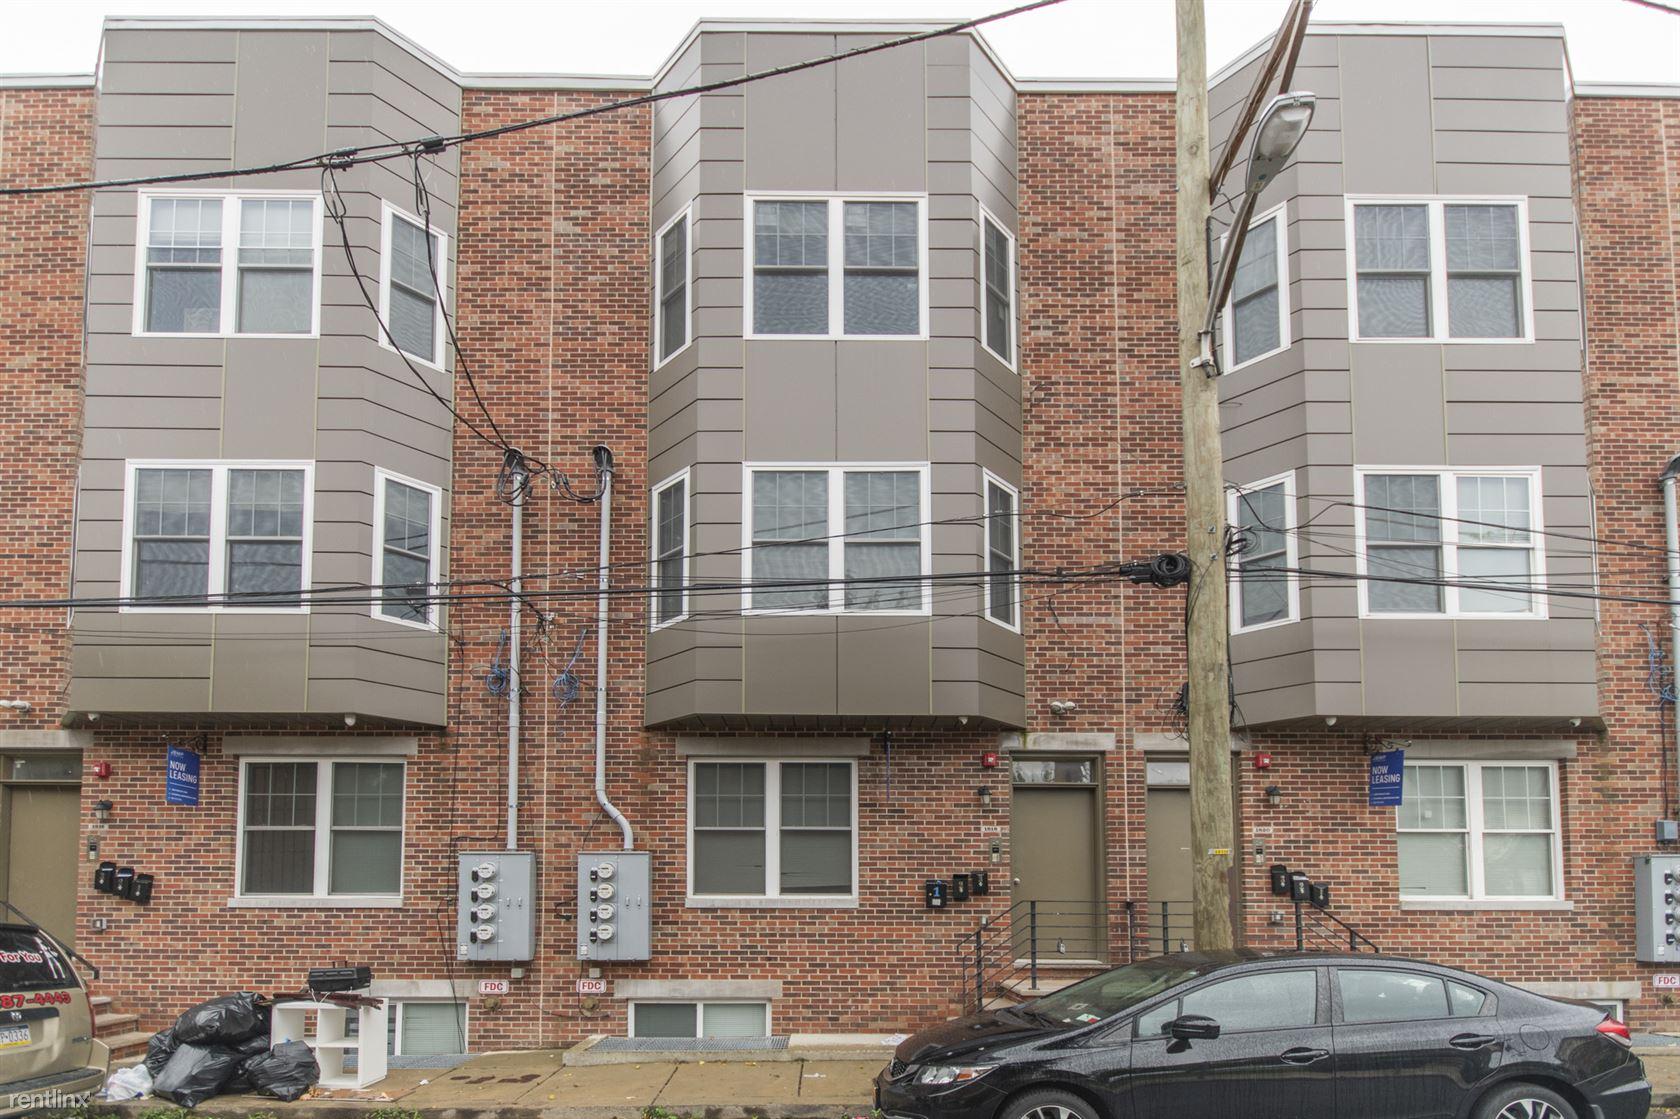 1814 HARLAN ST Unit 3, Philadelphia, PE - $1,275 CAD/ month